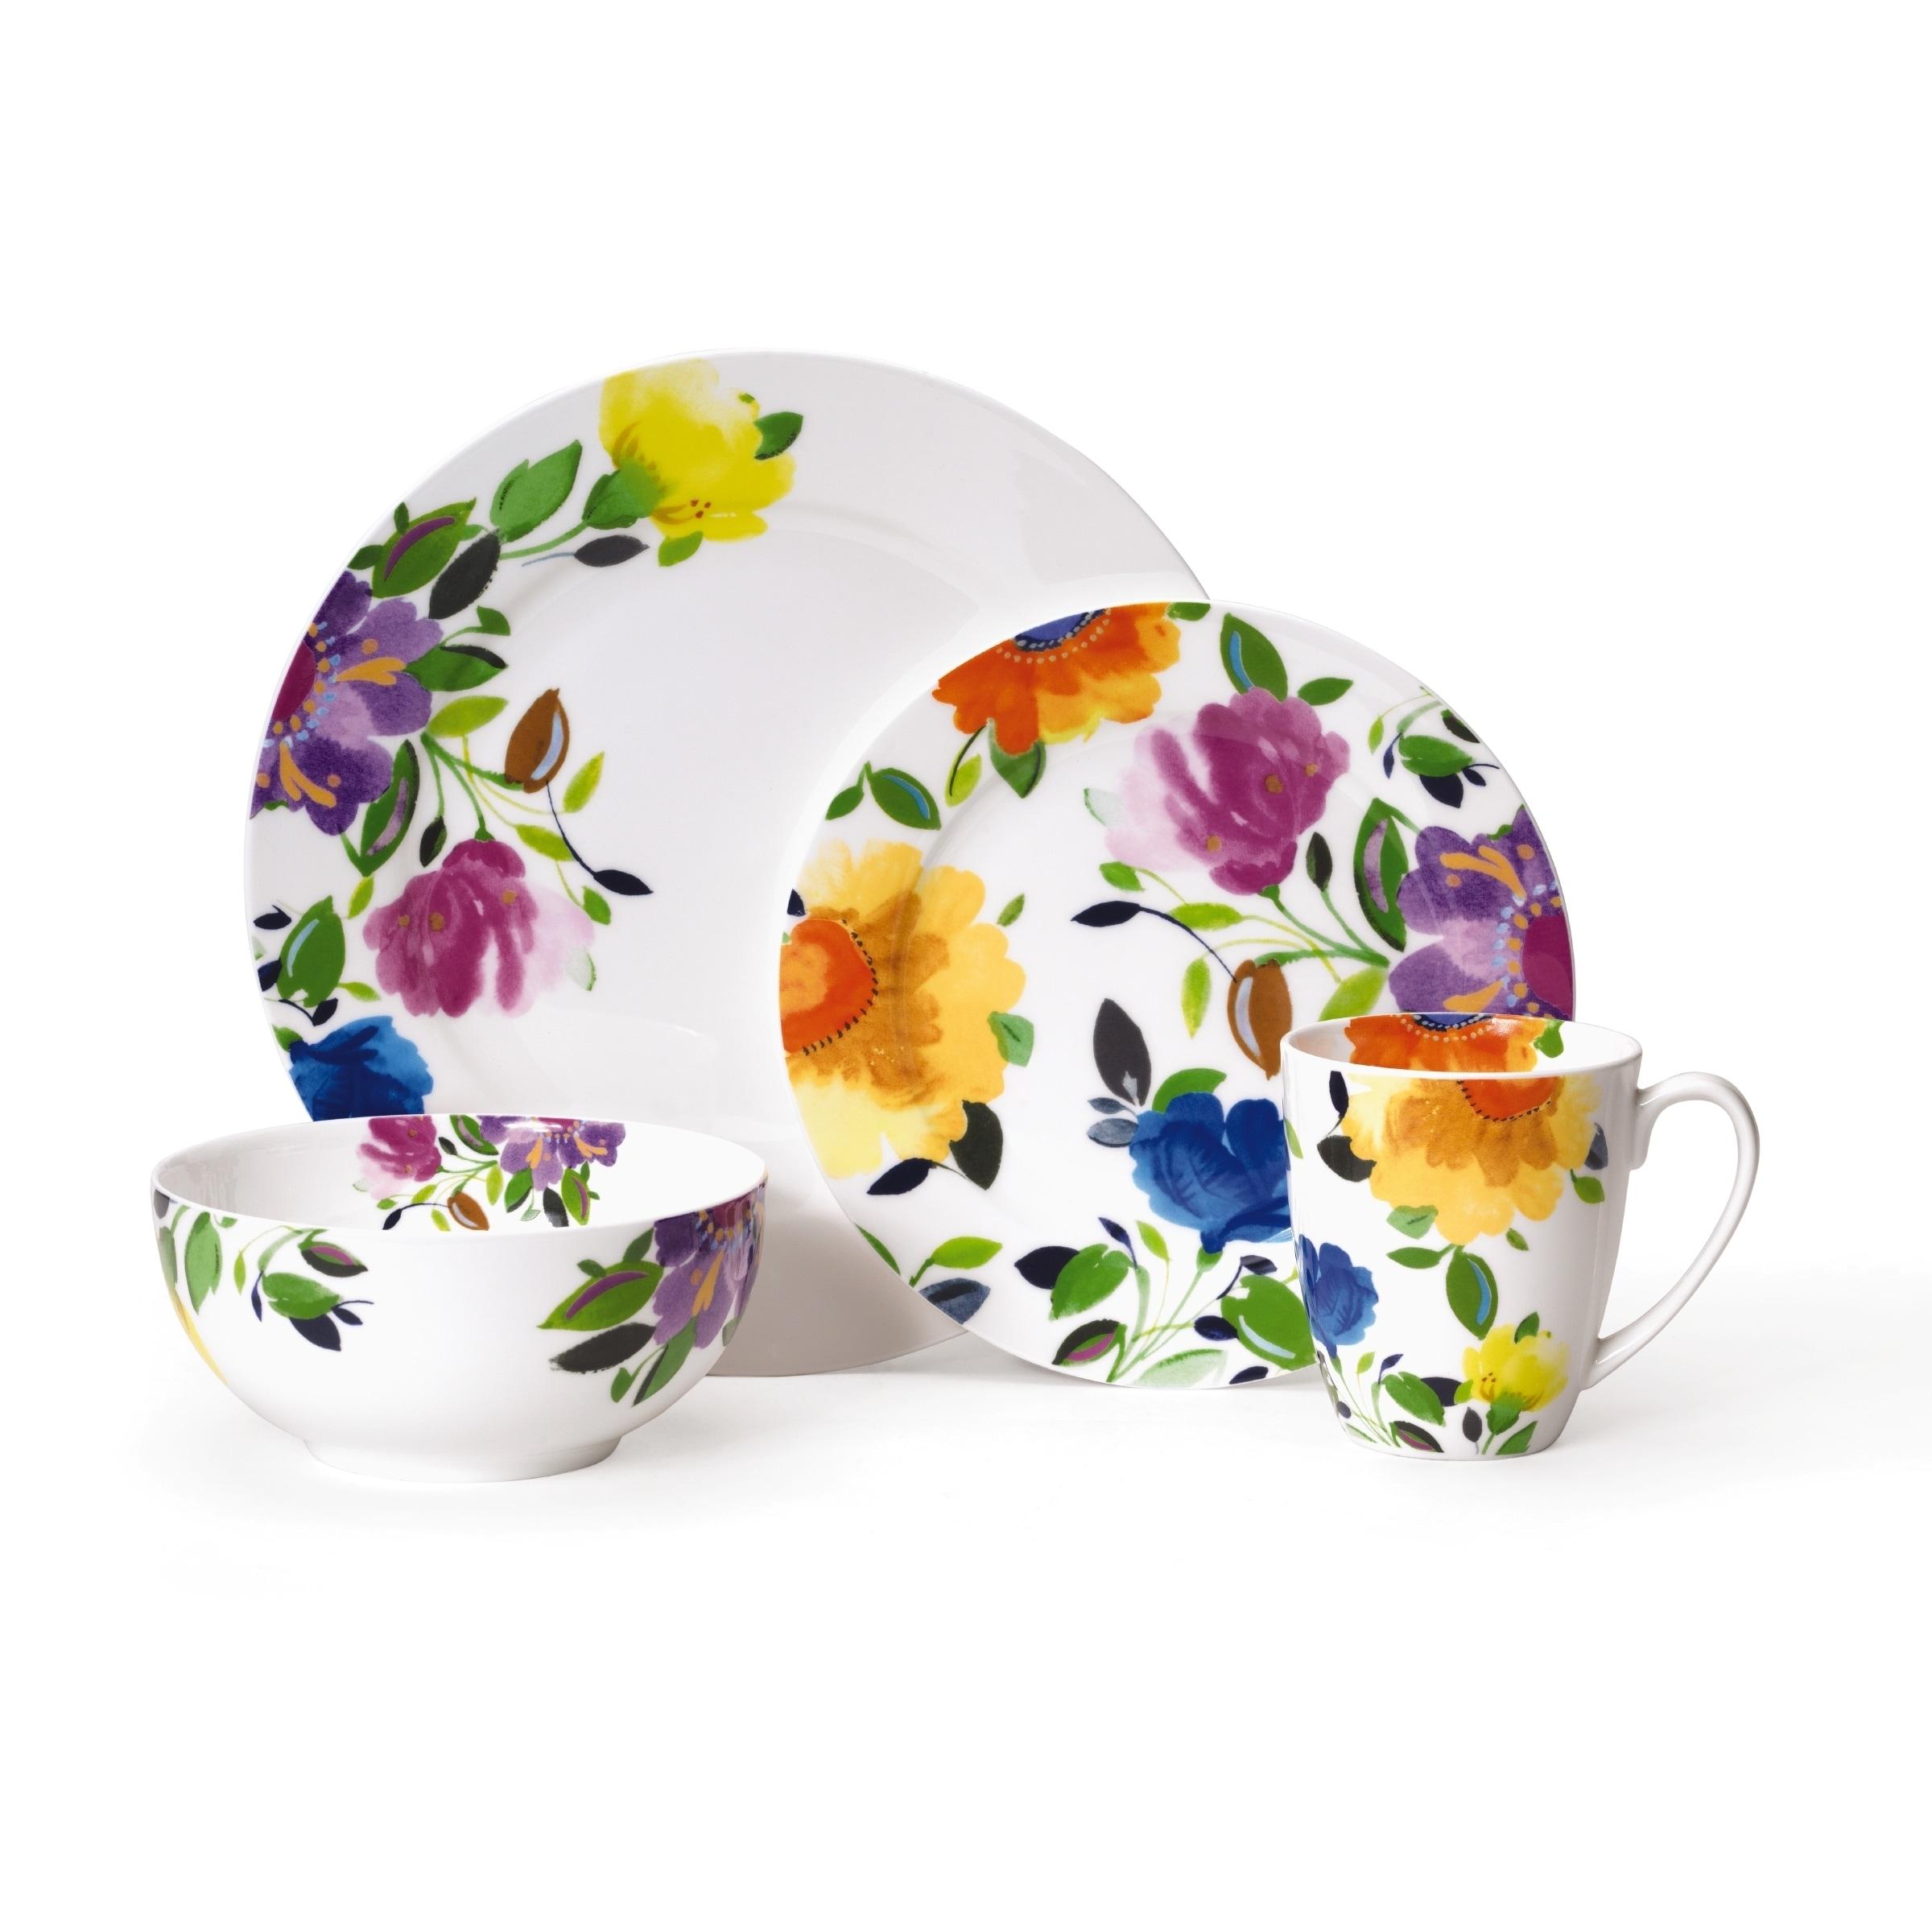 Porcelain Dinnerware For Less   Overstock.com. Porcelain Dinnerware For Less Overstock Com · Studio 33 ...  sc 1 st  Best Image Engine & Appealing Studio 33 Dinnerware Contemporary - Best Image Engine ...